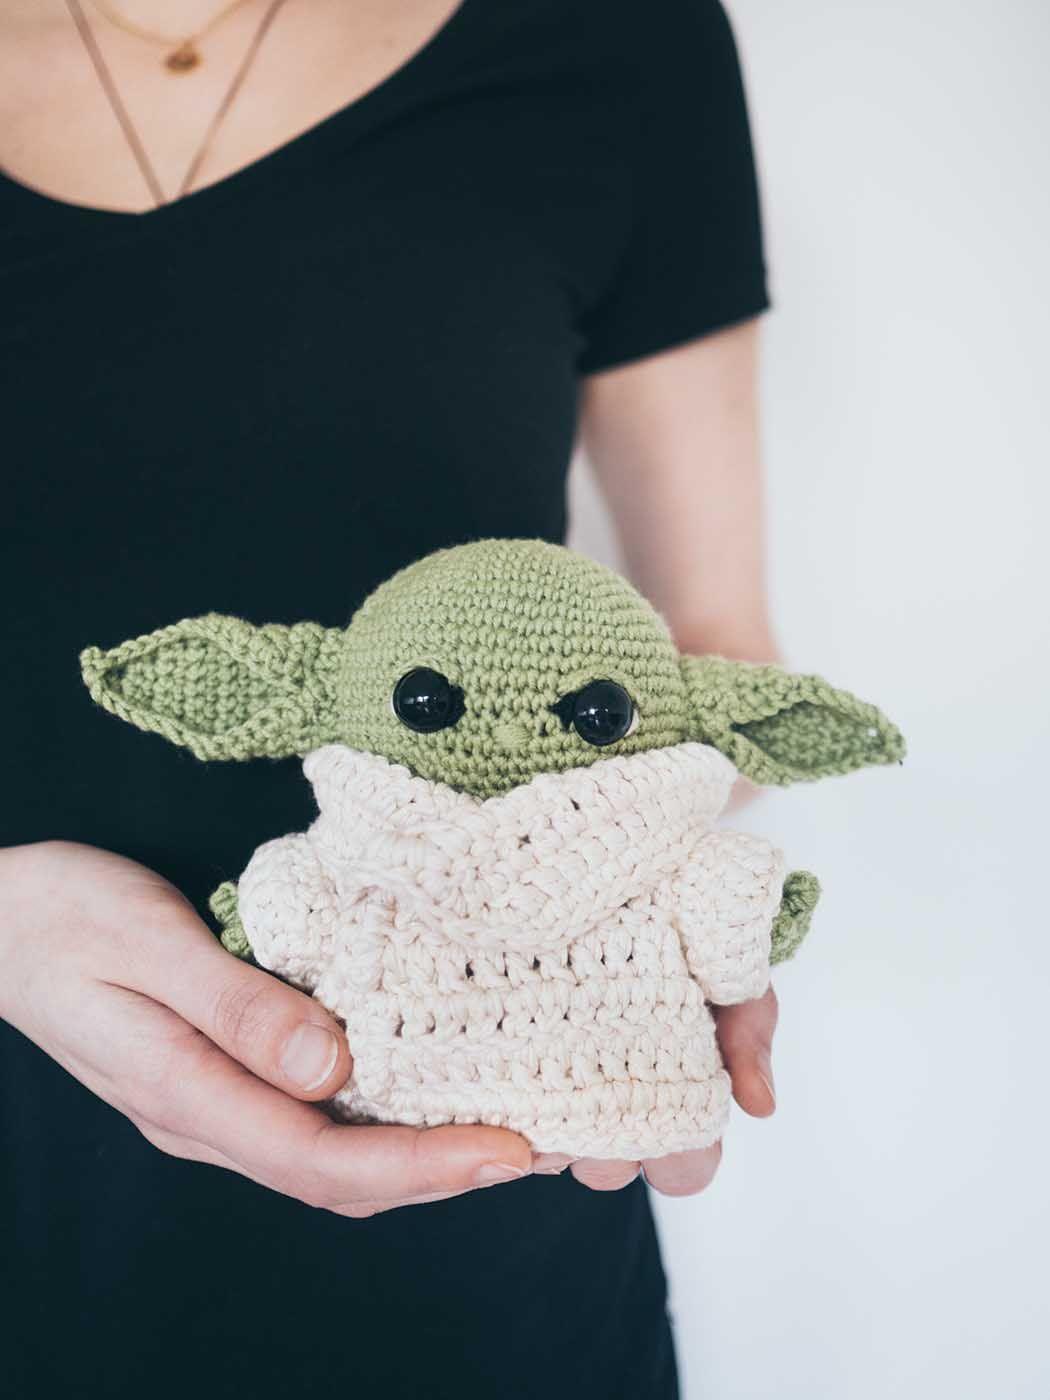 DIY Baby Yoda häkeln – kostenlose Anleitung